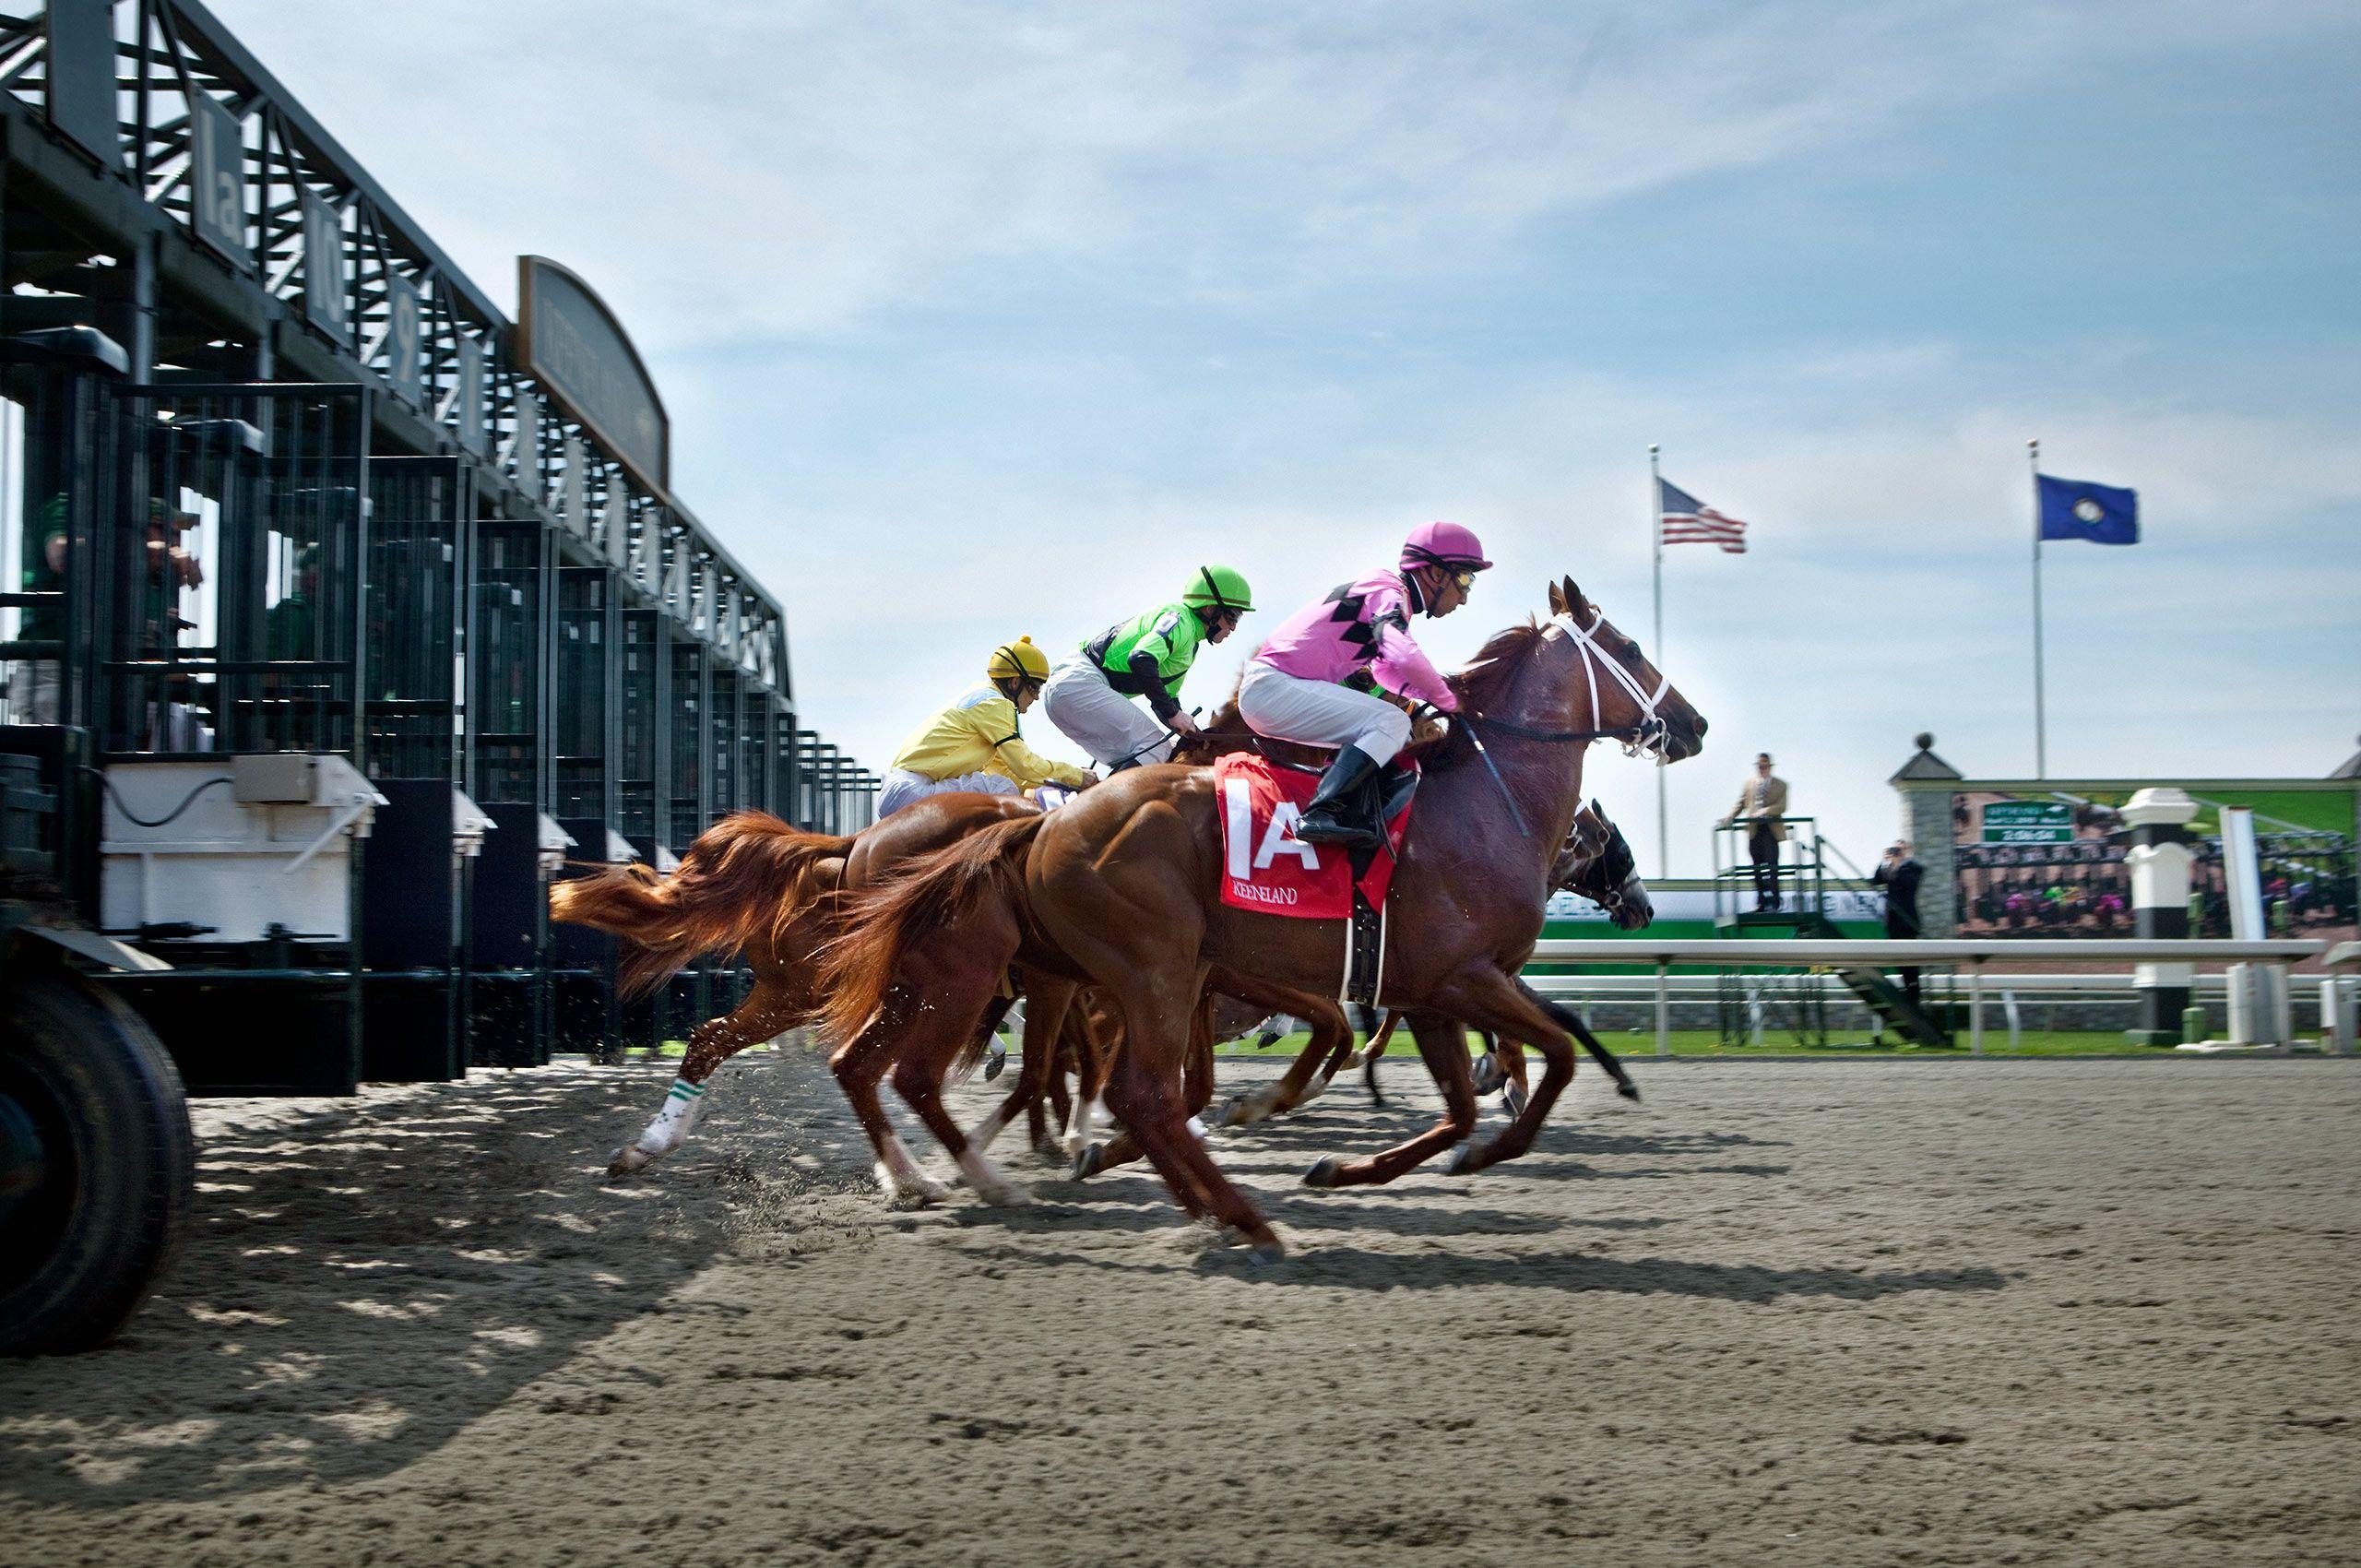 Horserace-Startingline-takeoff-HenrikOlundPhotography.jpg